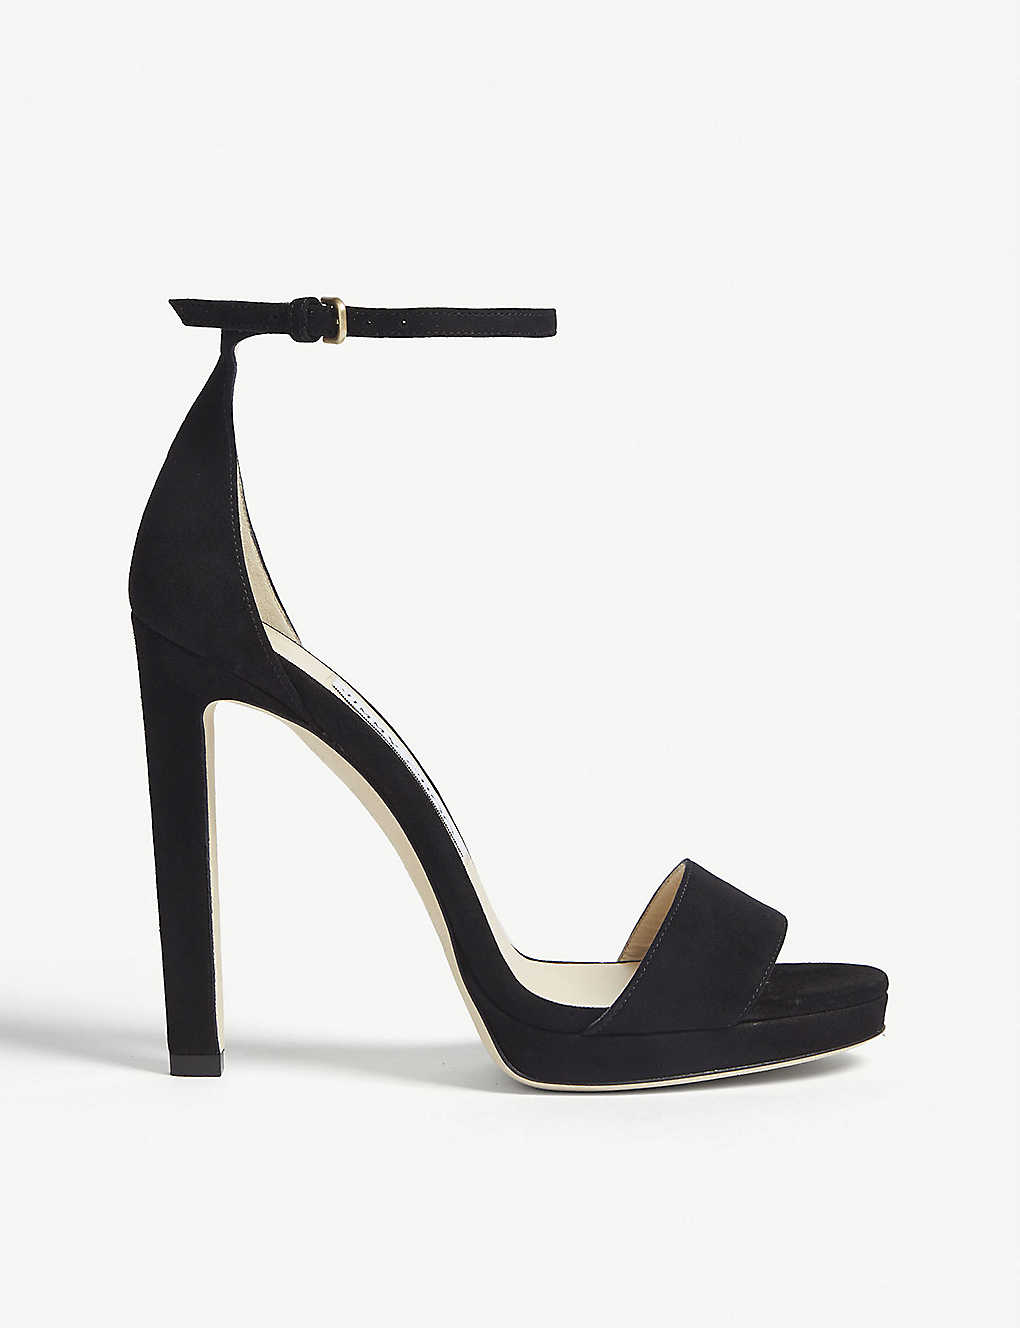 0a1af58b5fc5 JIMMY CHOO - Misty 120 suede heeled sandals